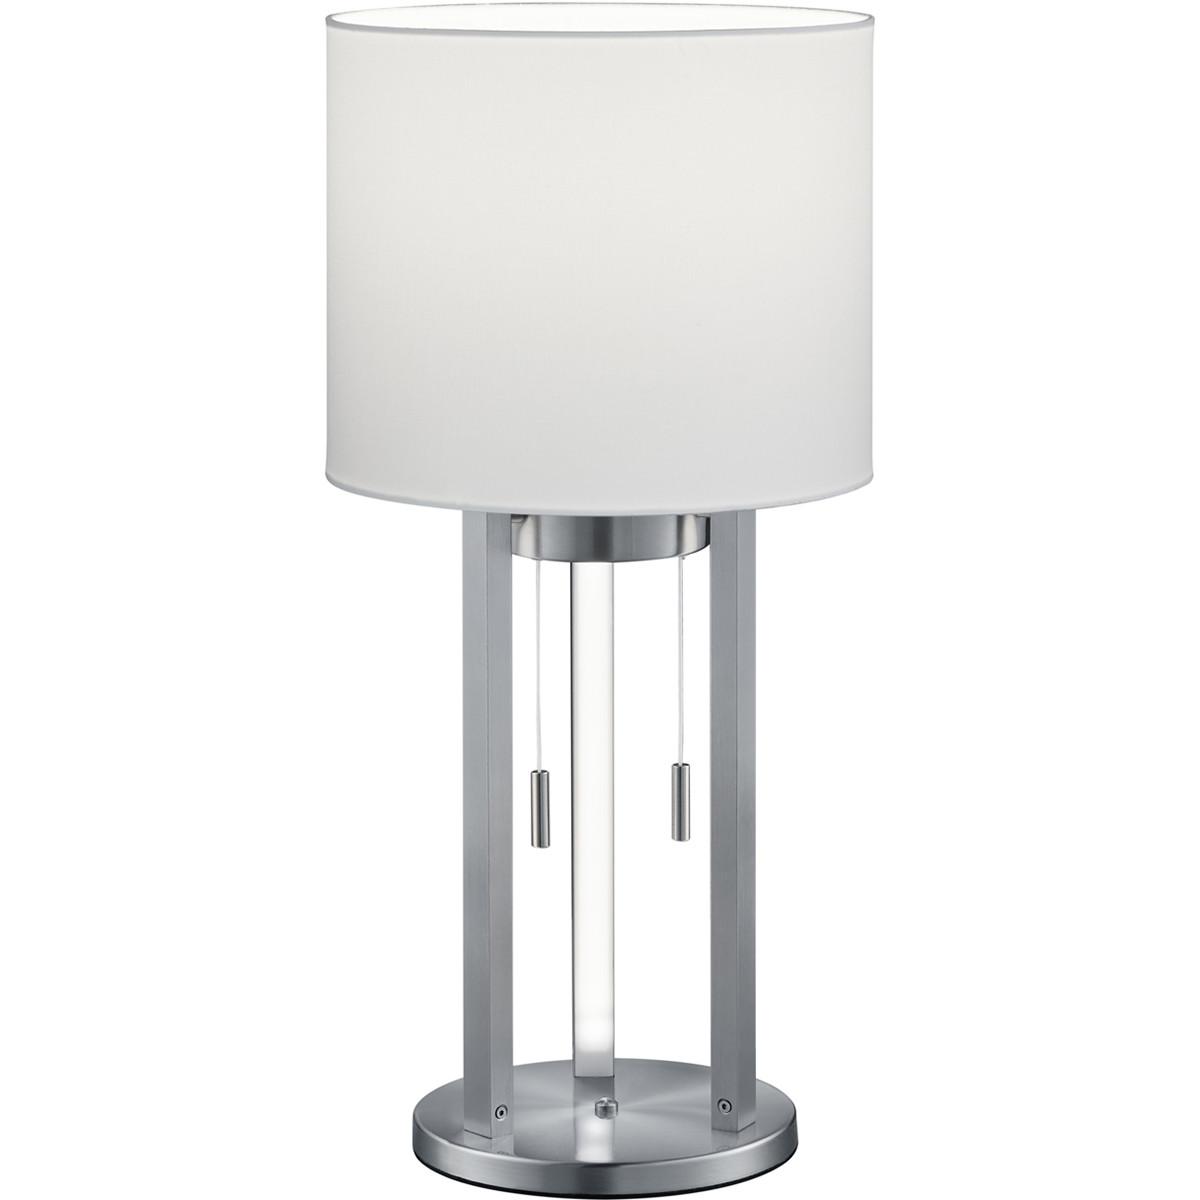 LED Tafellamp - Trion Tondira - 6W - Warm Wit 3000K - E27 Fitting - 4-lichts - Rond - Mat Nikkel - A